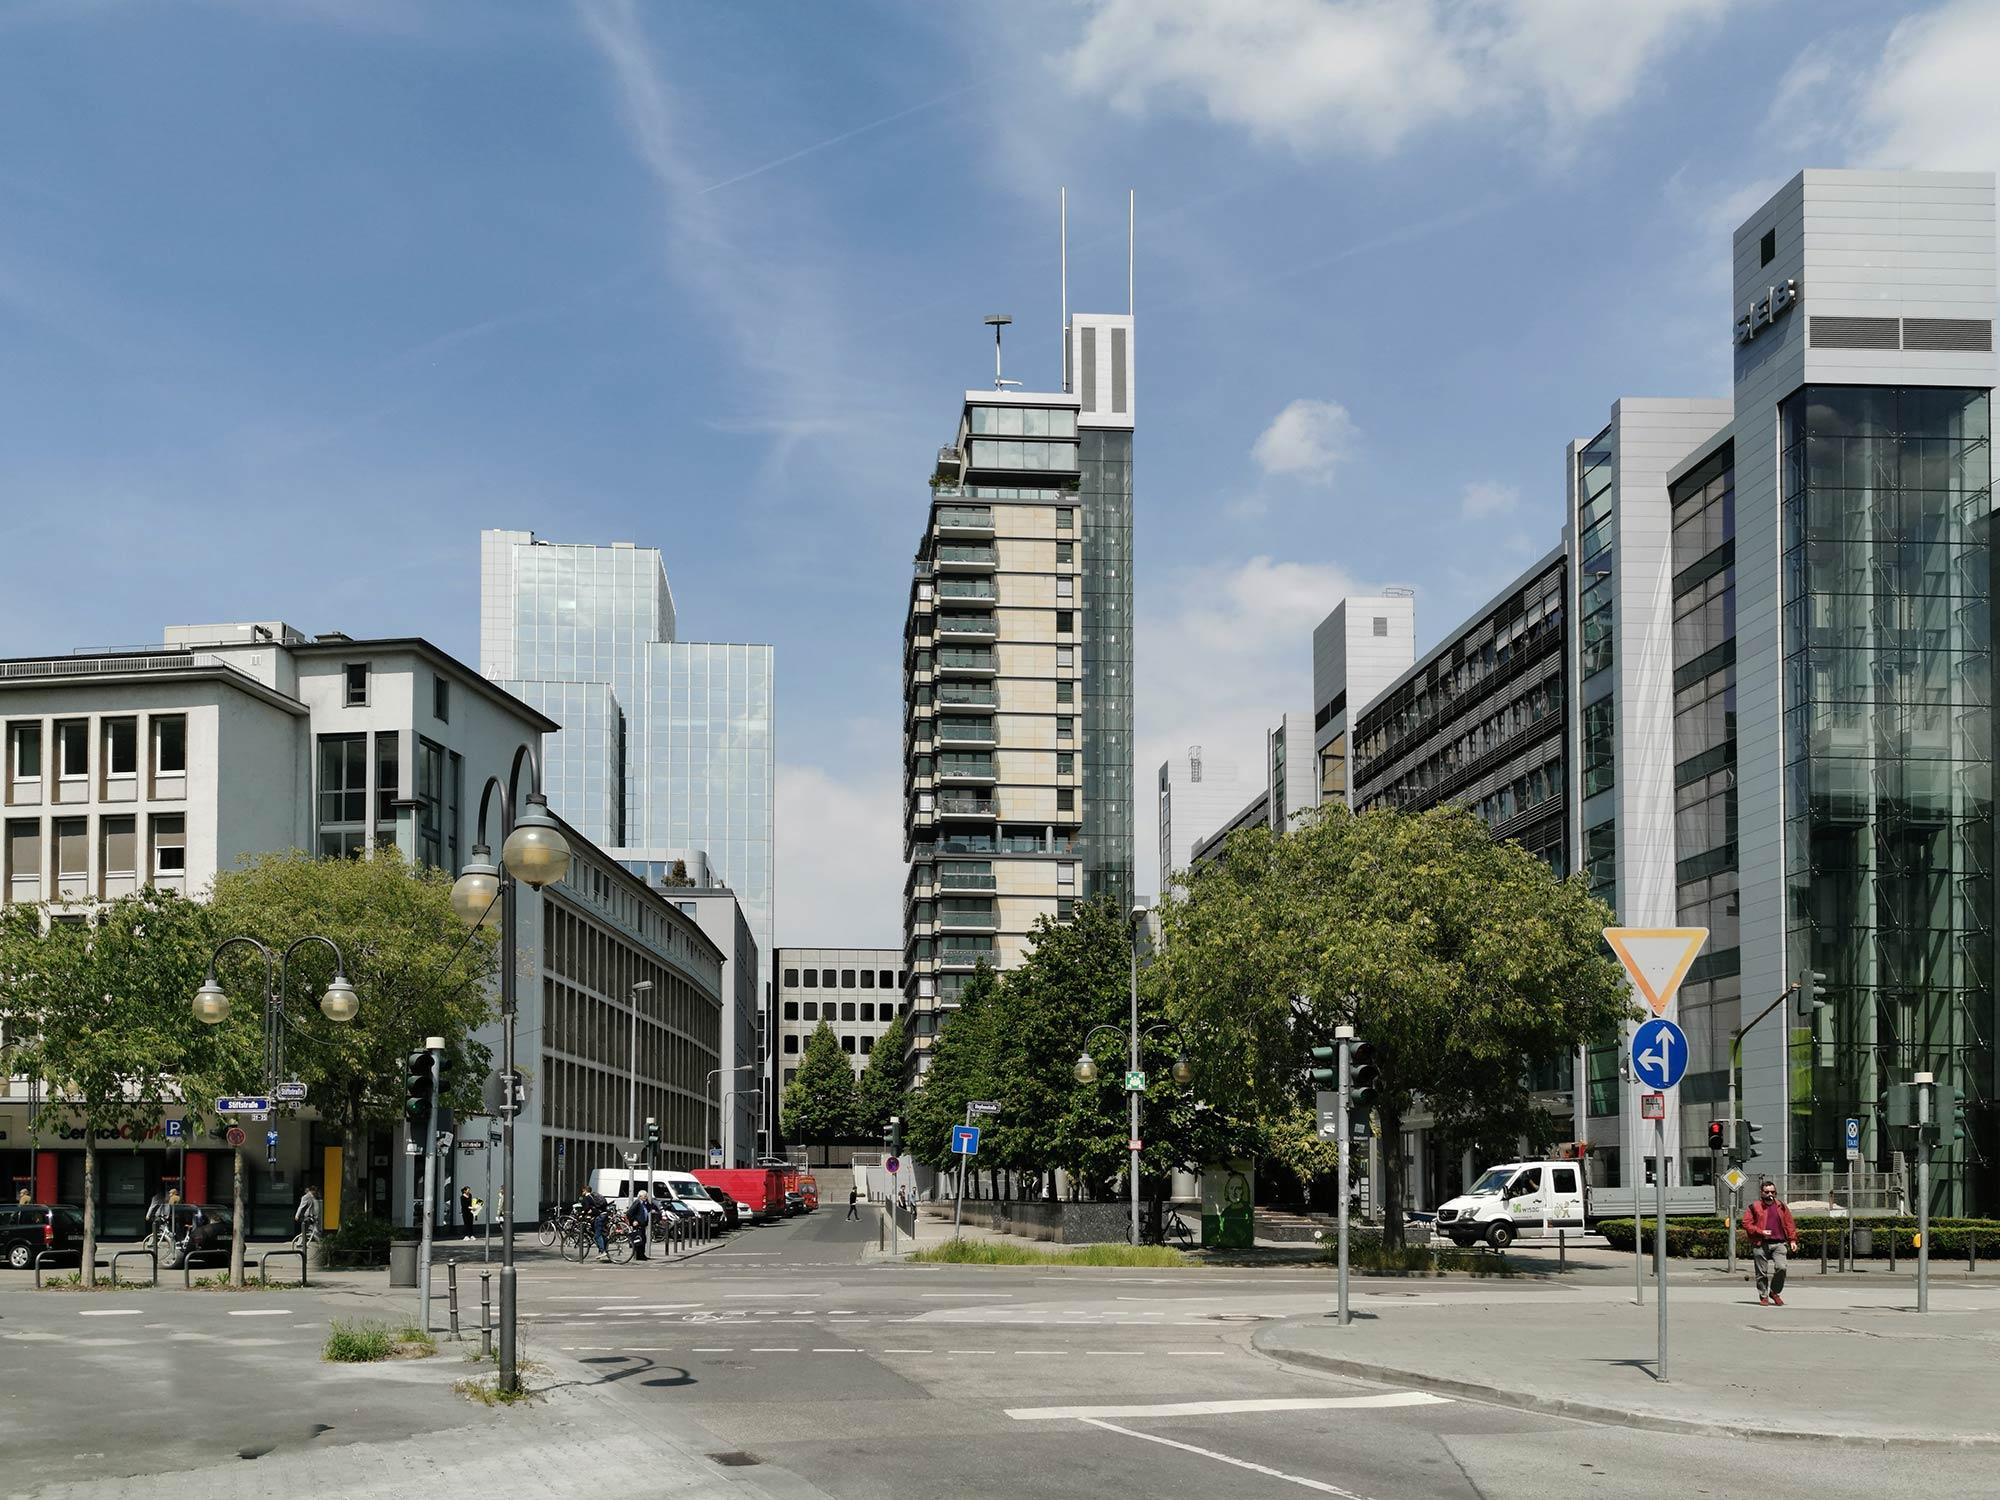 Frankfurt Skylight Wohnturm - Skylight Tower in Frankfurt am Main - Innenstadt Wohn-Turm